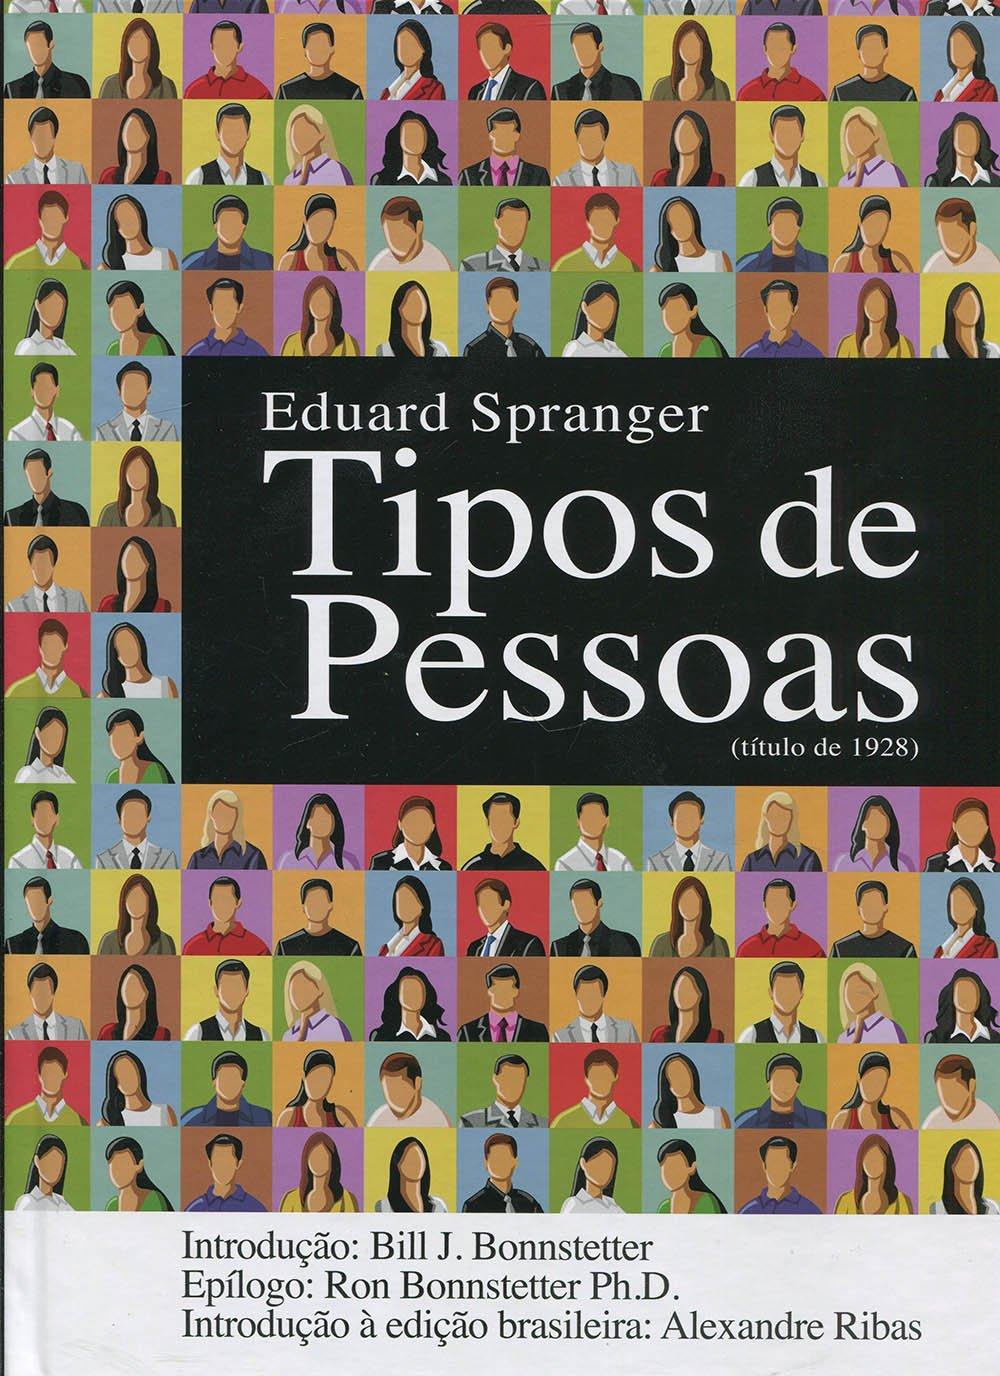 Tipos de Pessoas: Amazon.es: Eduard Spranger: Libros